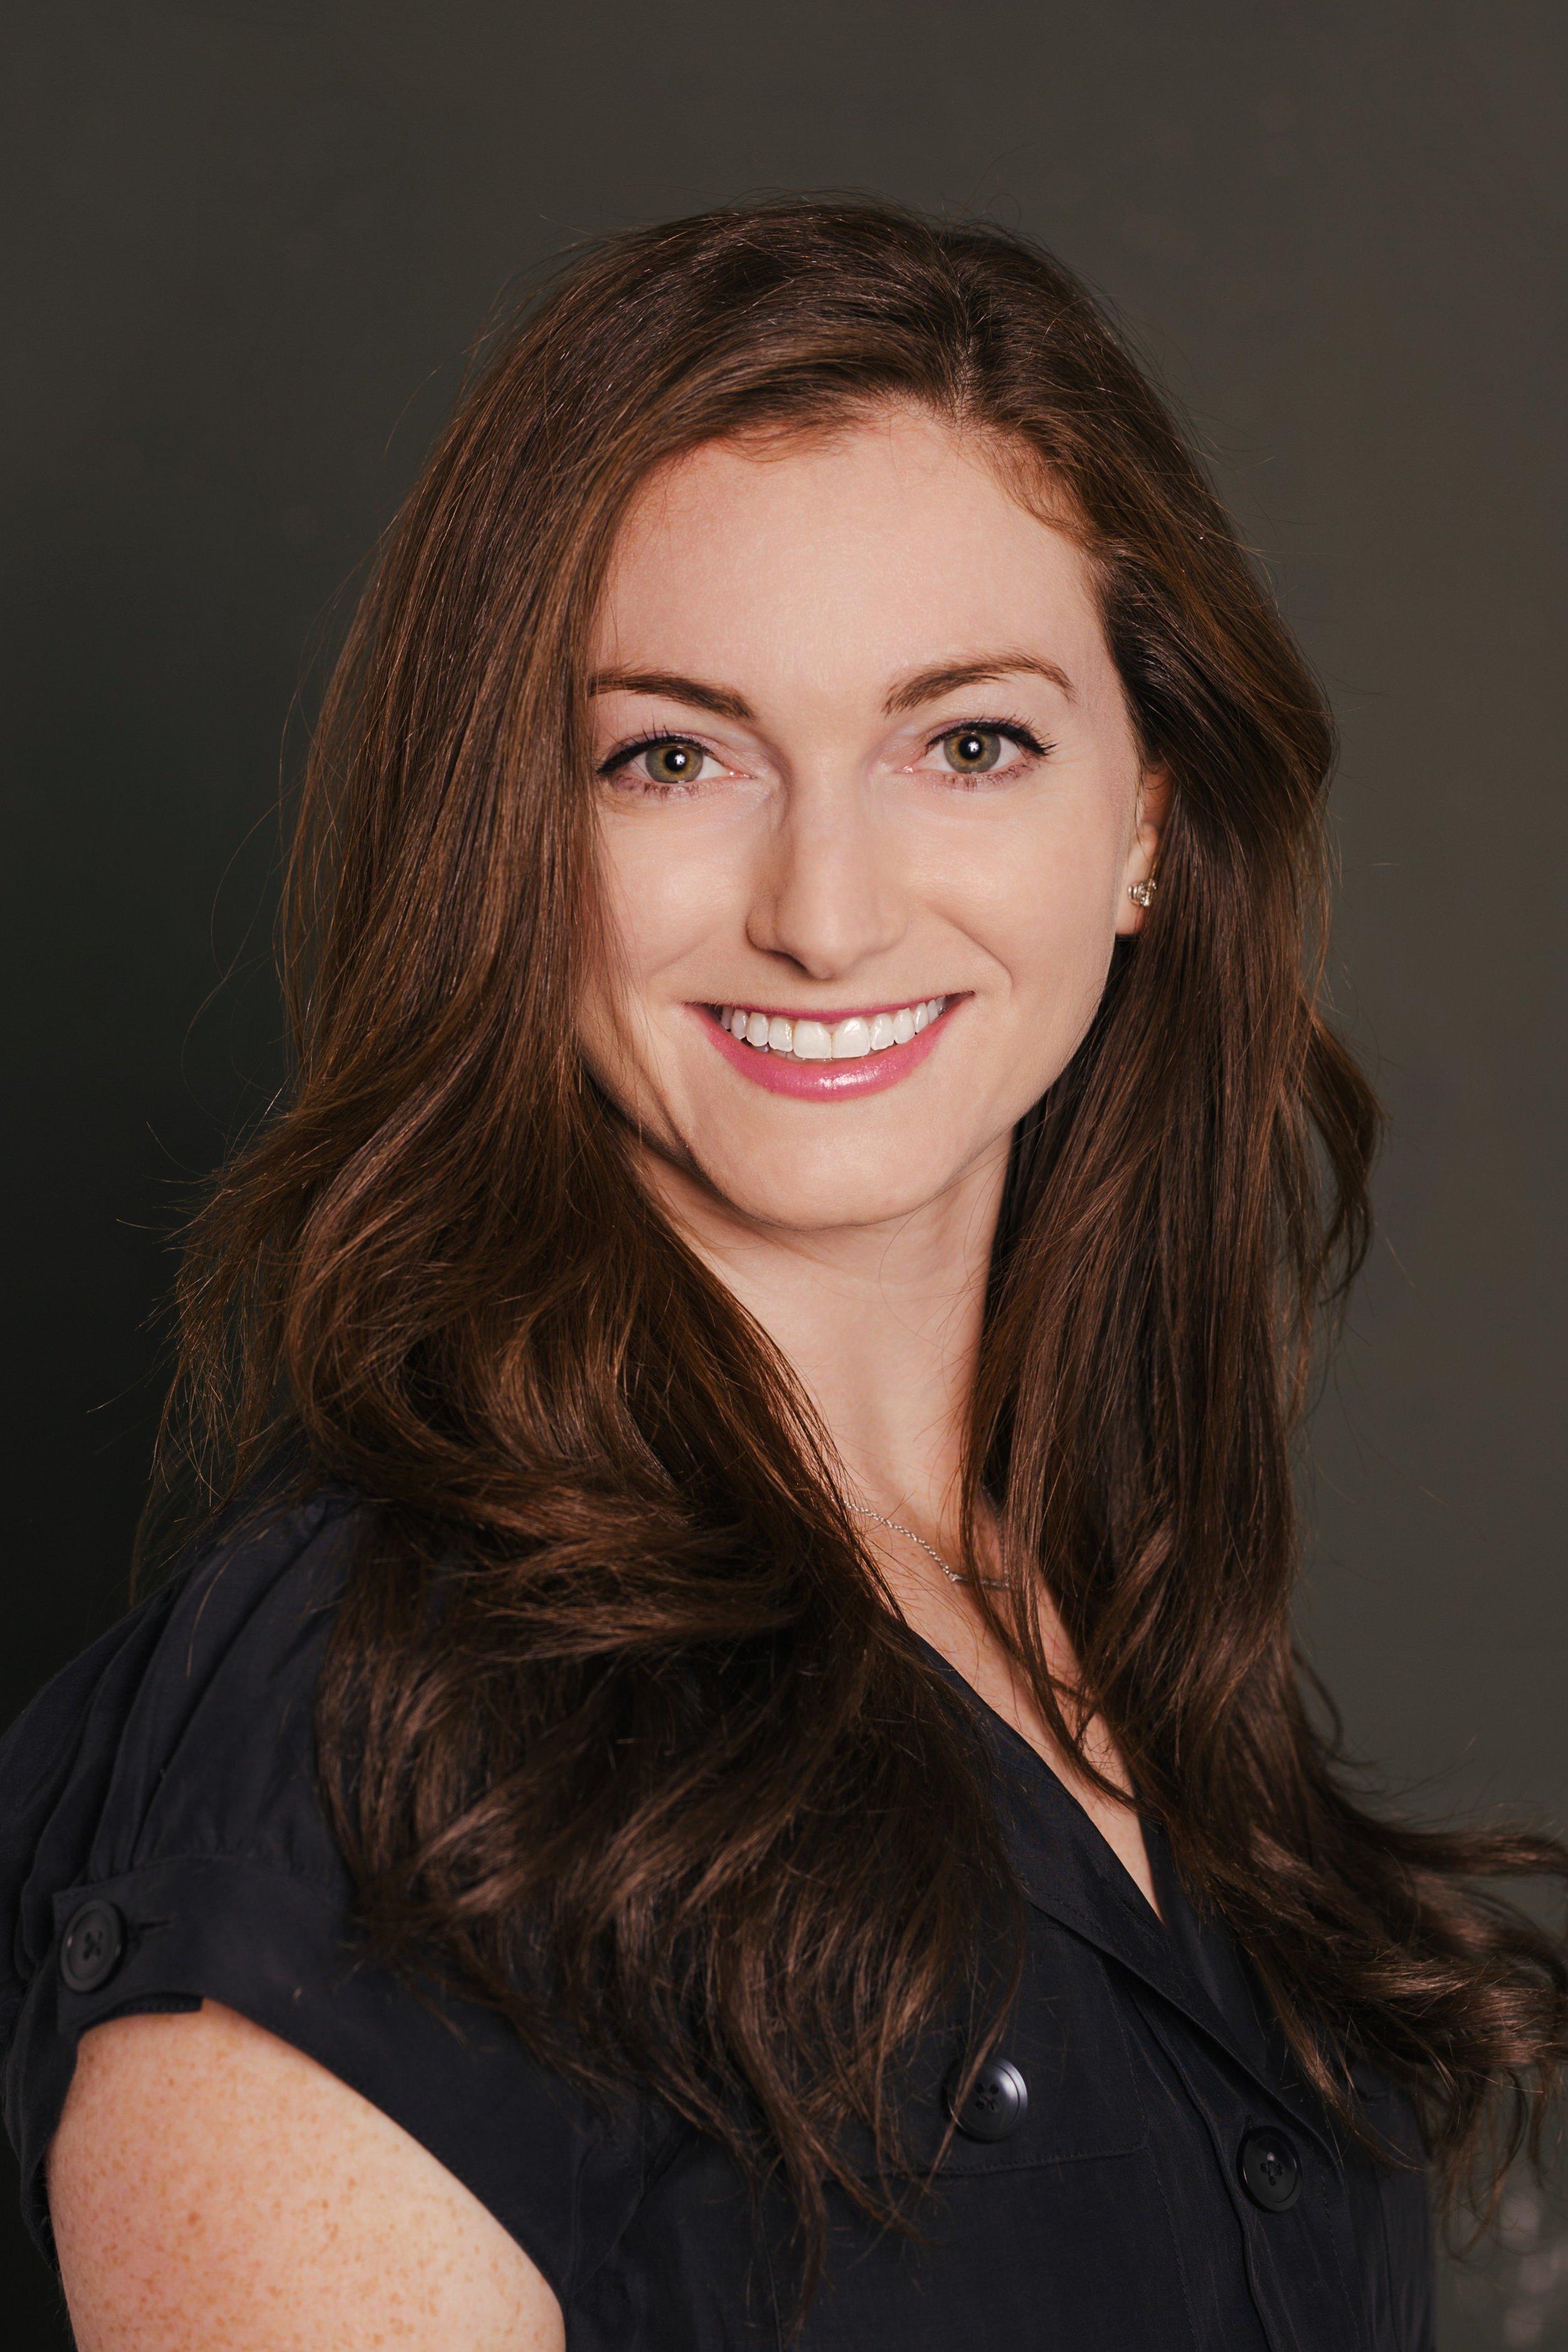 Alison Silvia - Wedding/Event Planner